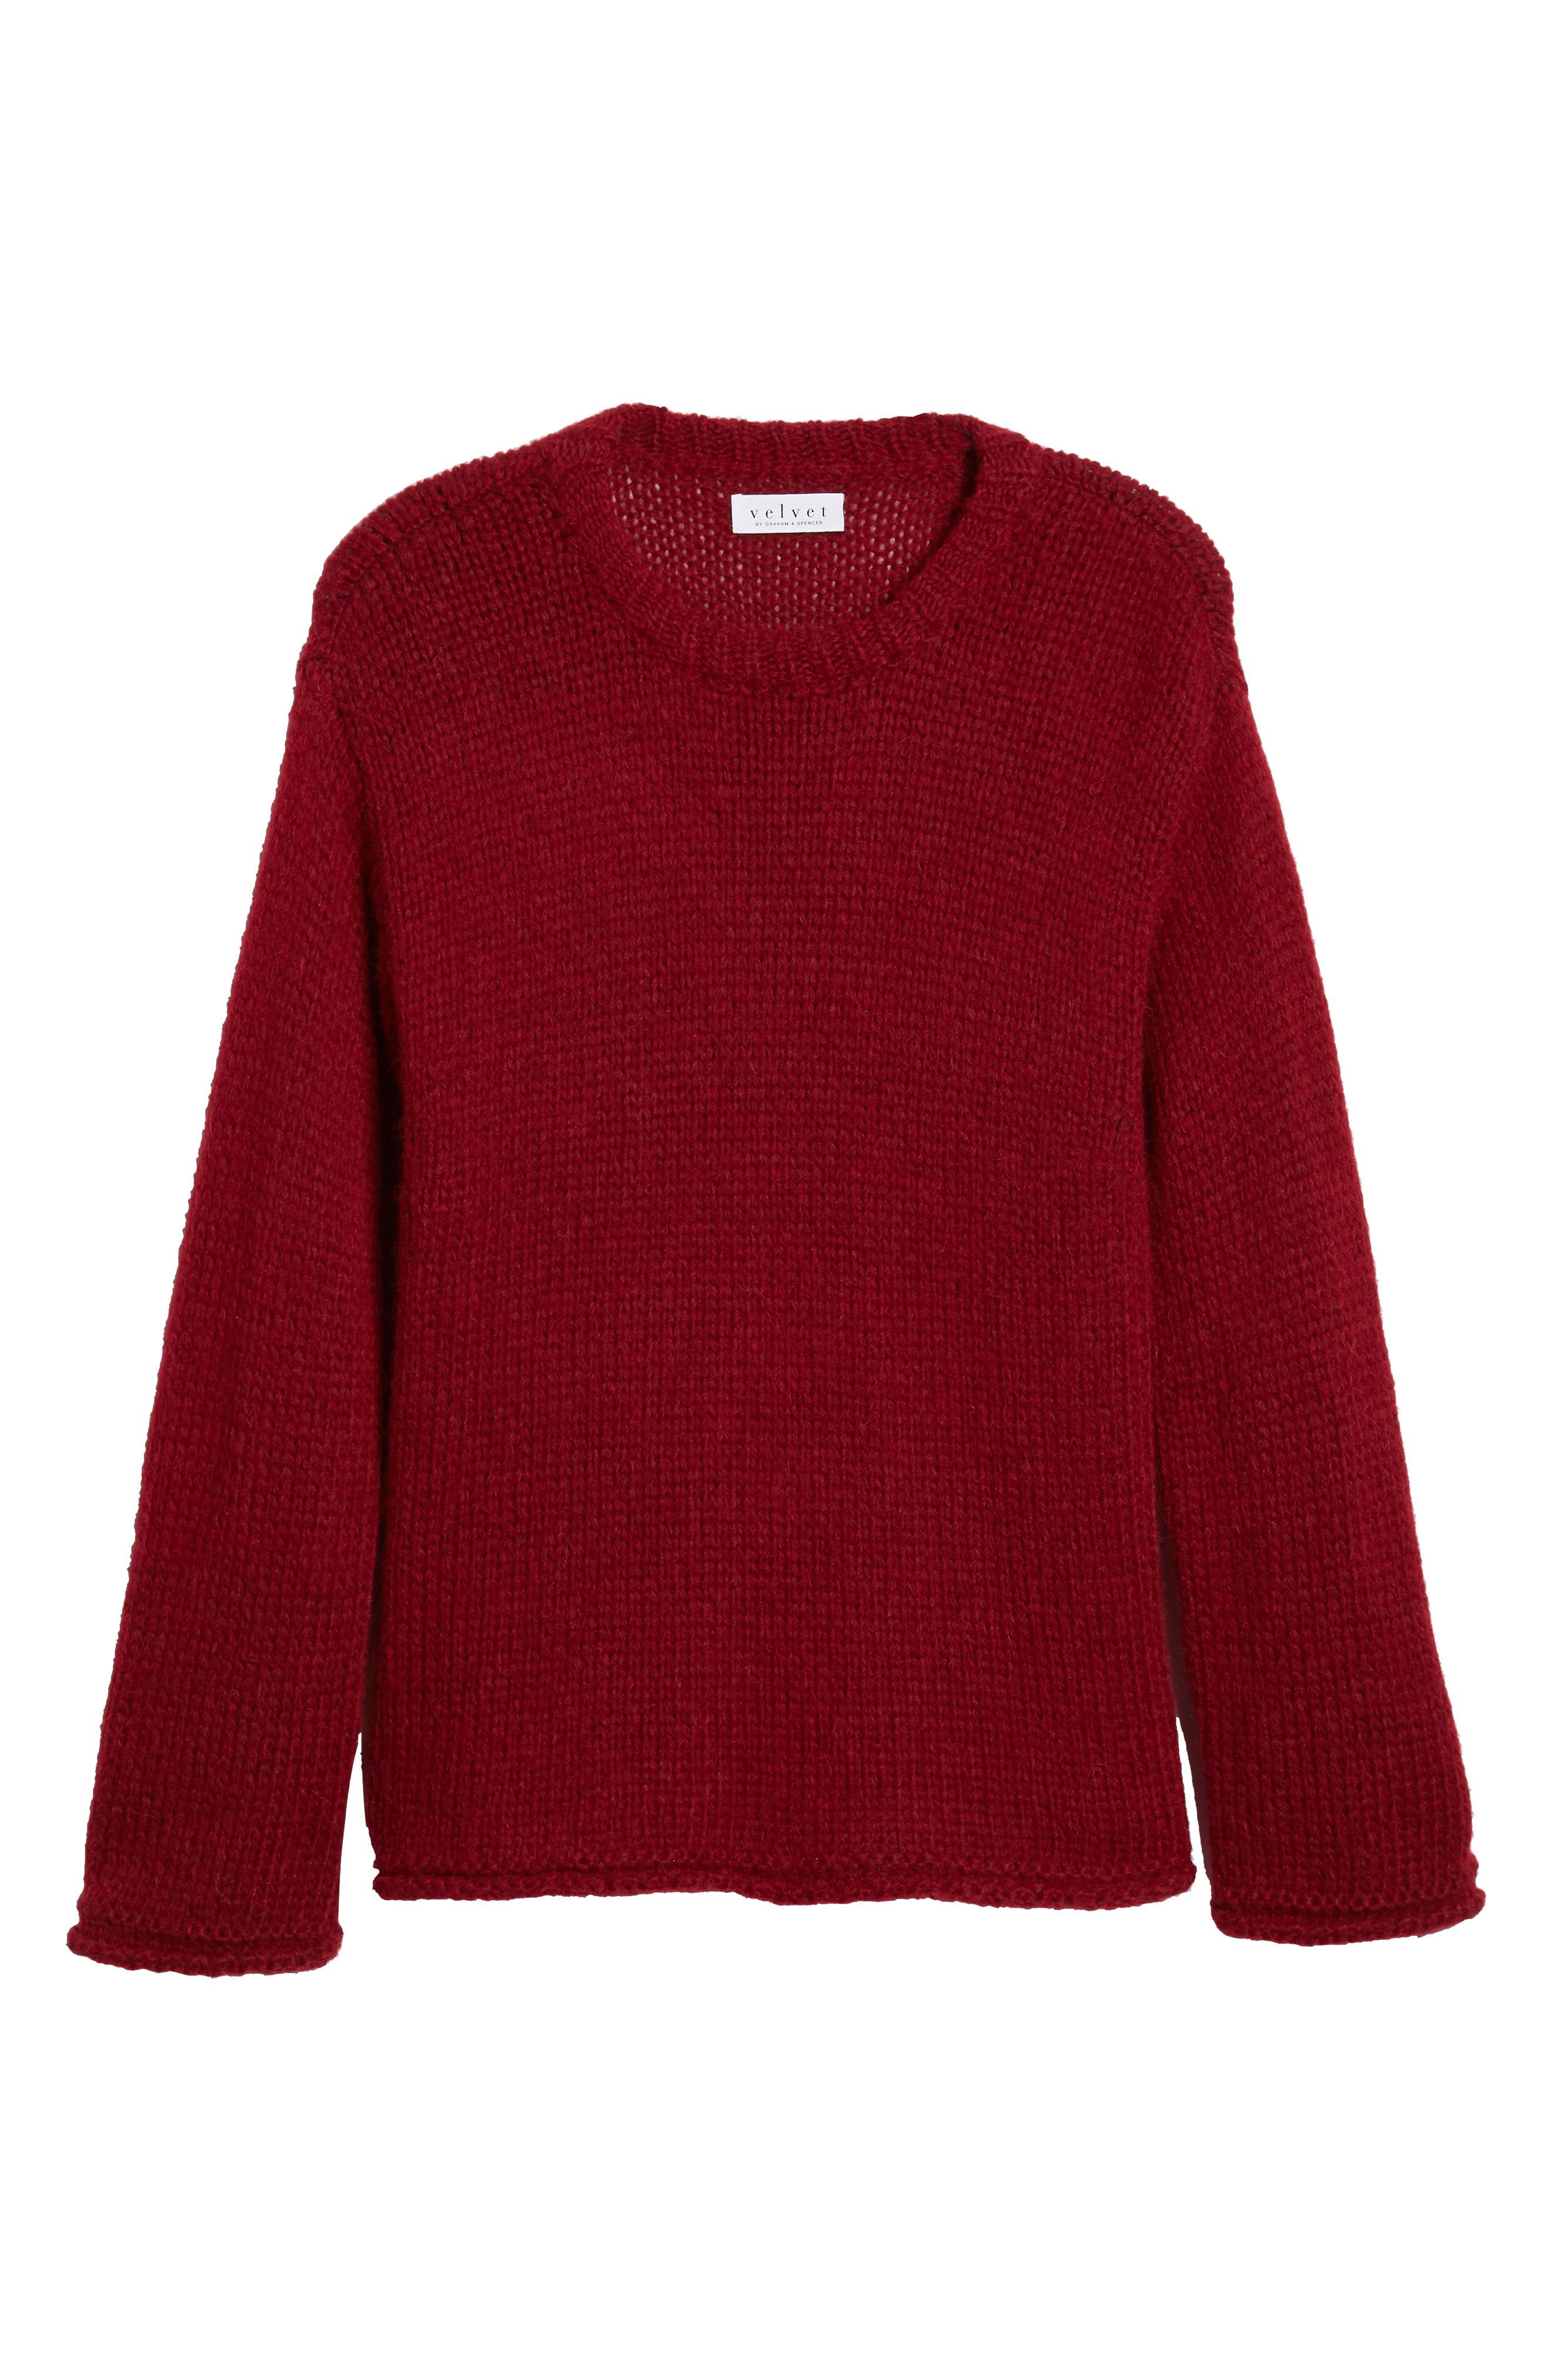 Wool Alpaca Blend Crewneck Sweater,                             Alternate thumbnail 6, color,                             WINE